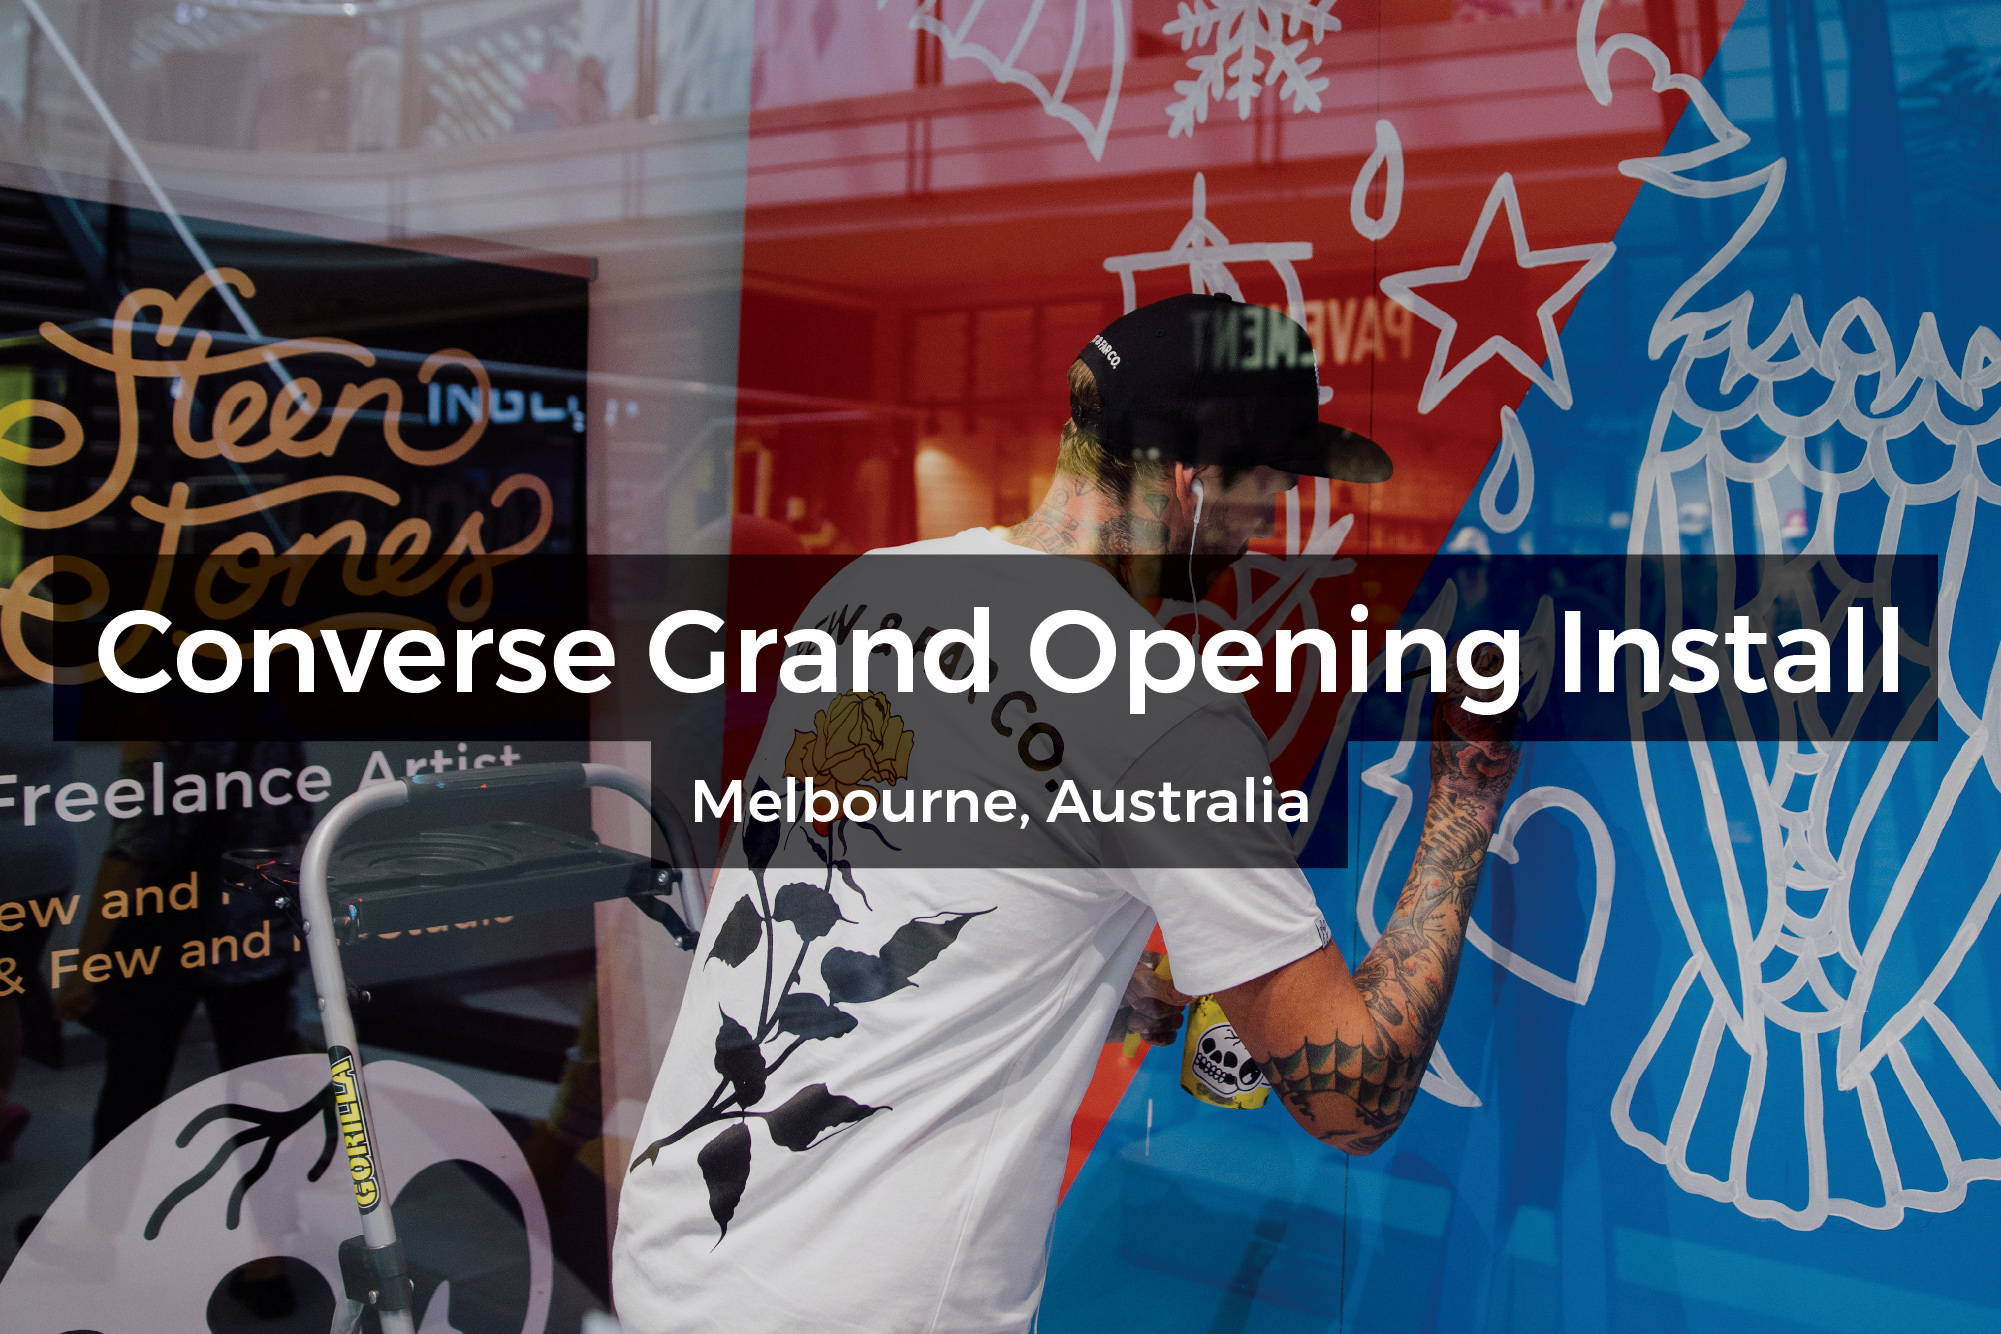 Converse Grand Opening mural installation in Melbourne, Australia by Steen Jones